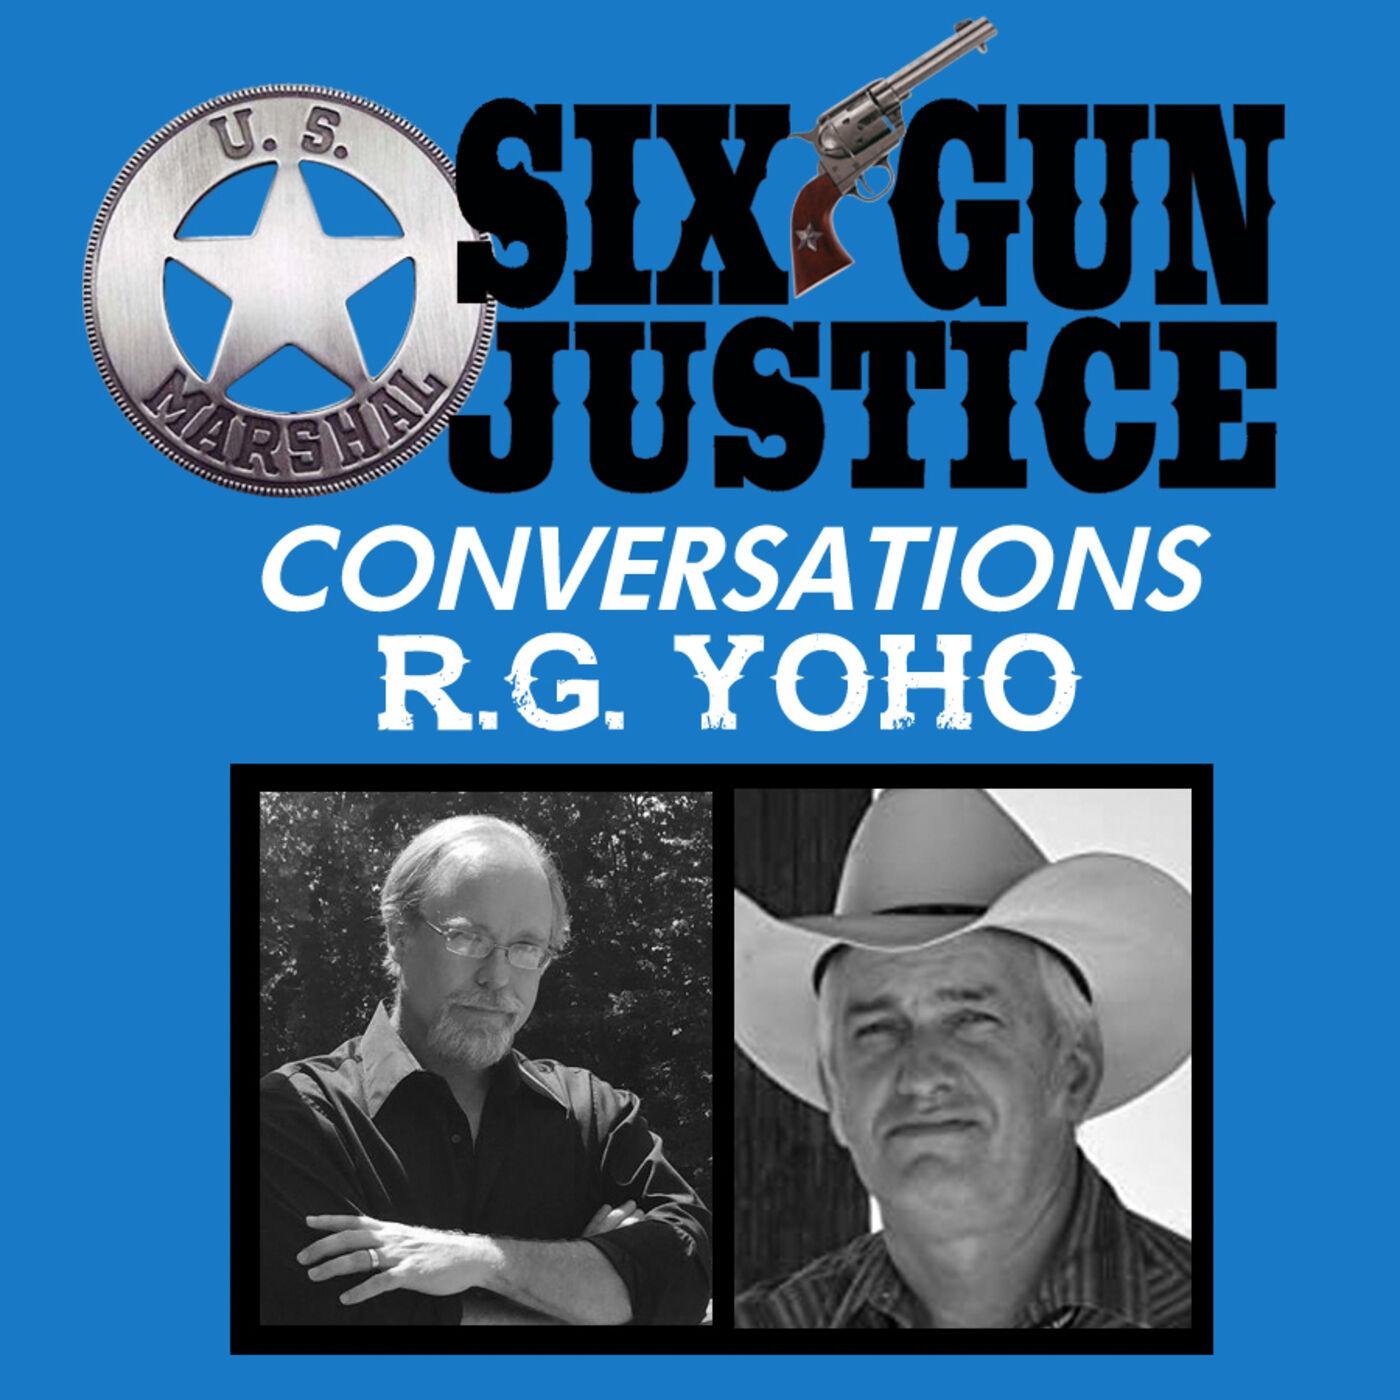 SIX-GUN JUSTICE CONVERSATIONS—R. G. YOHO